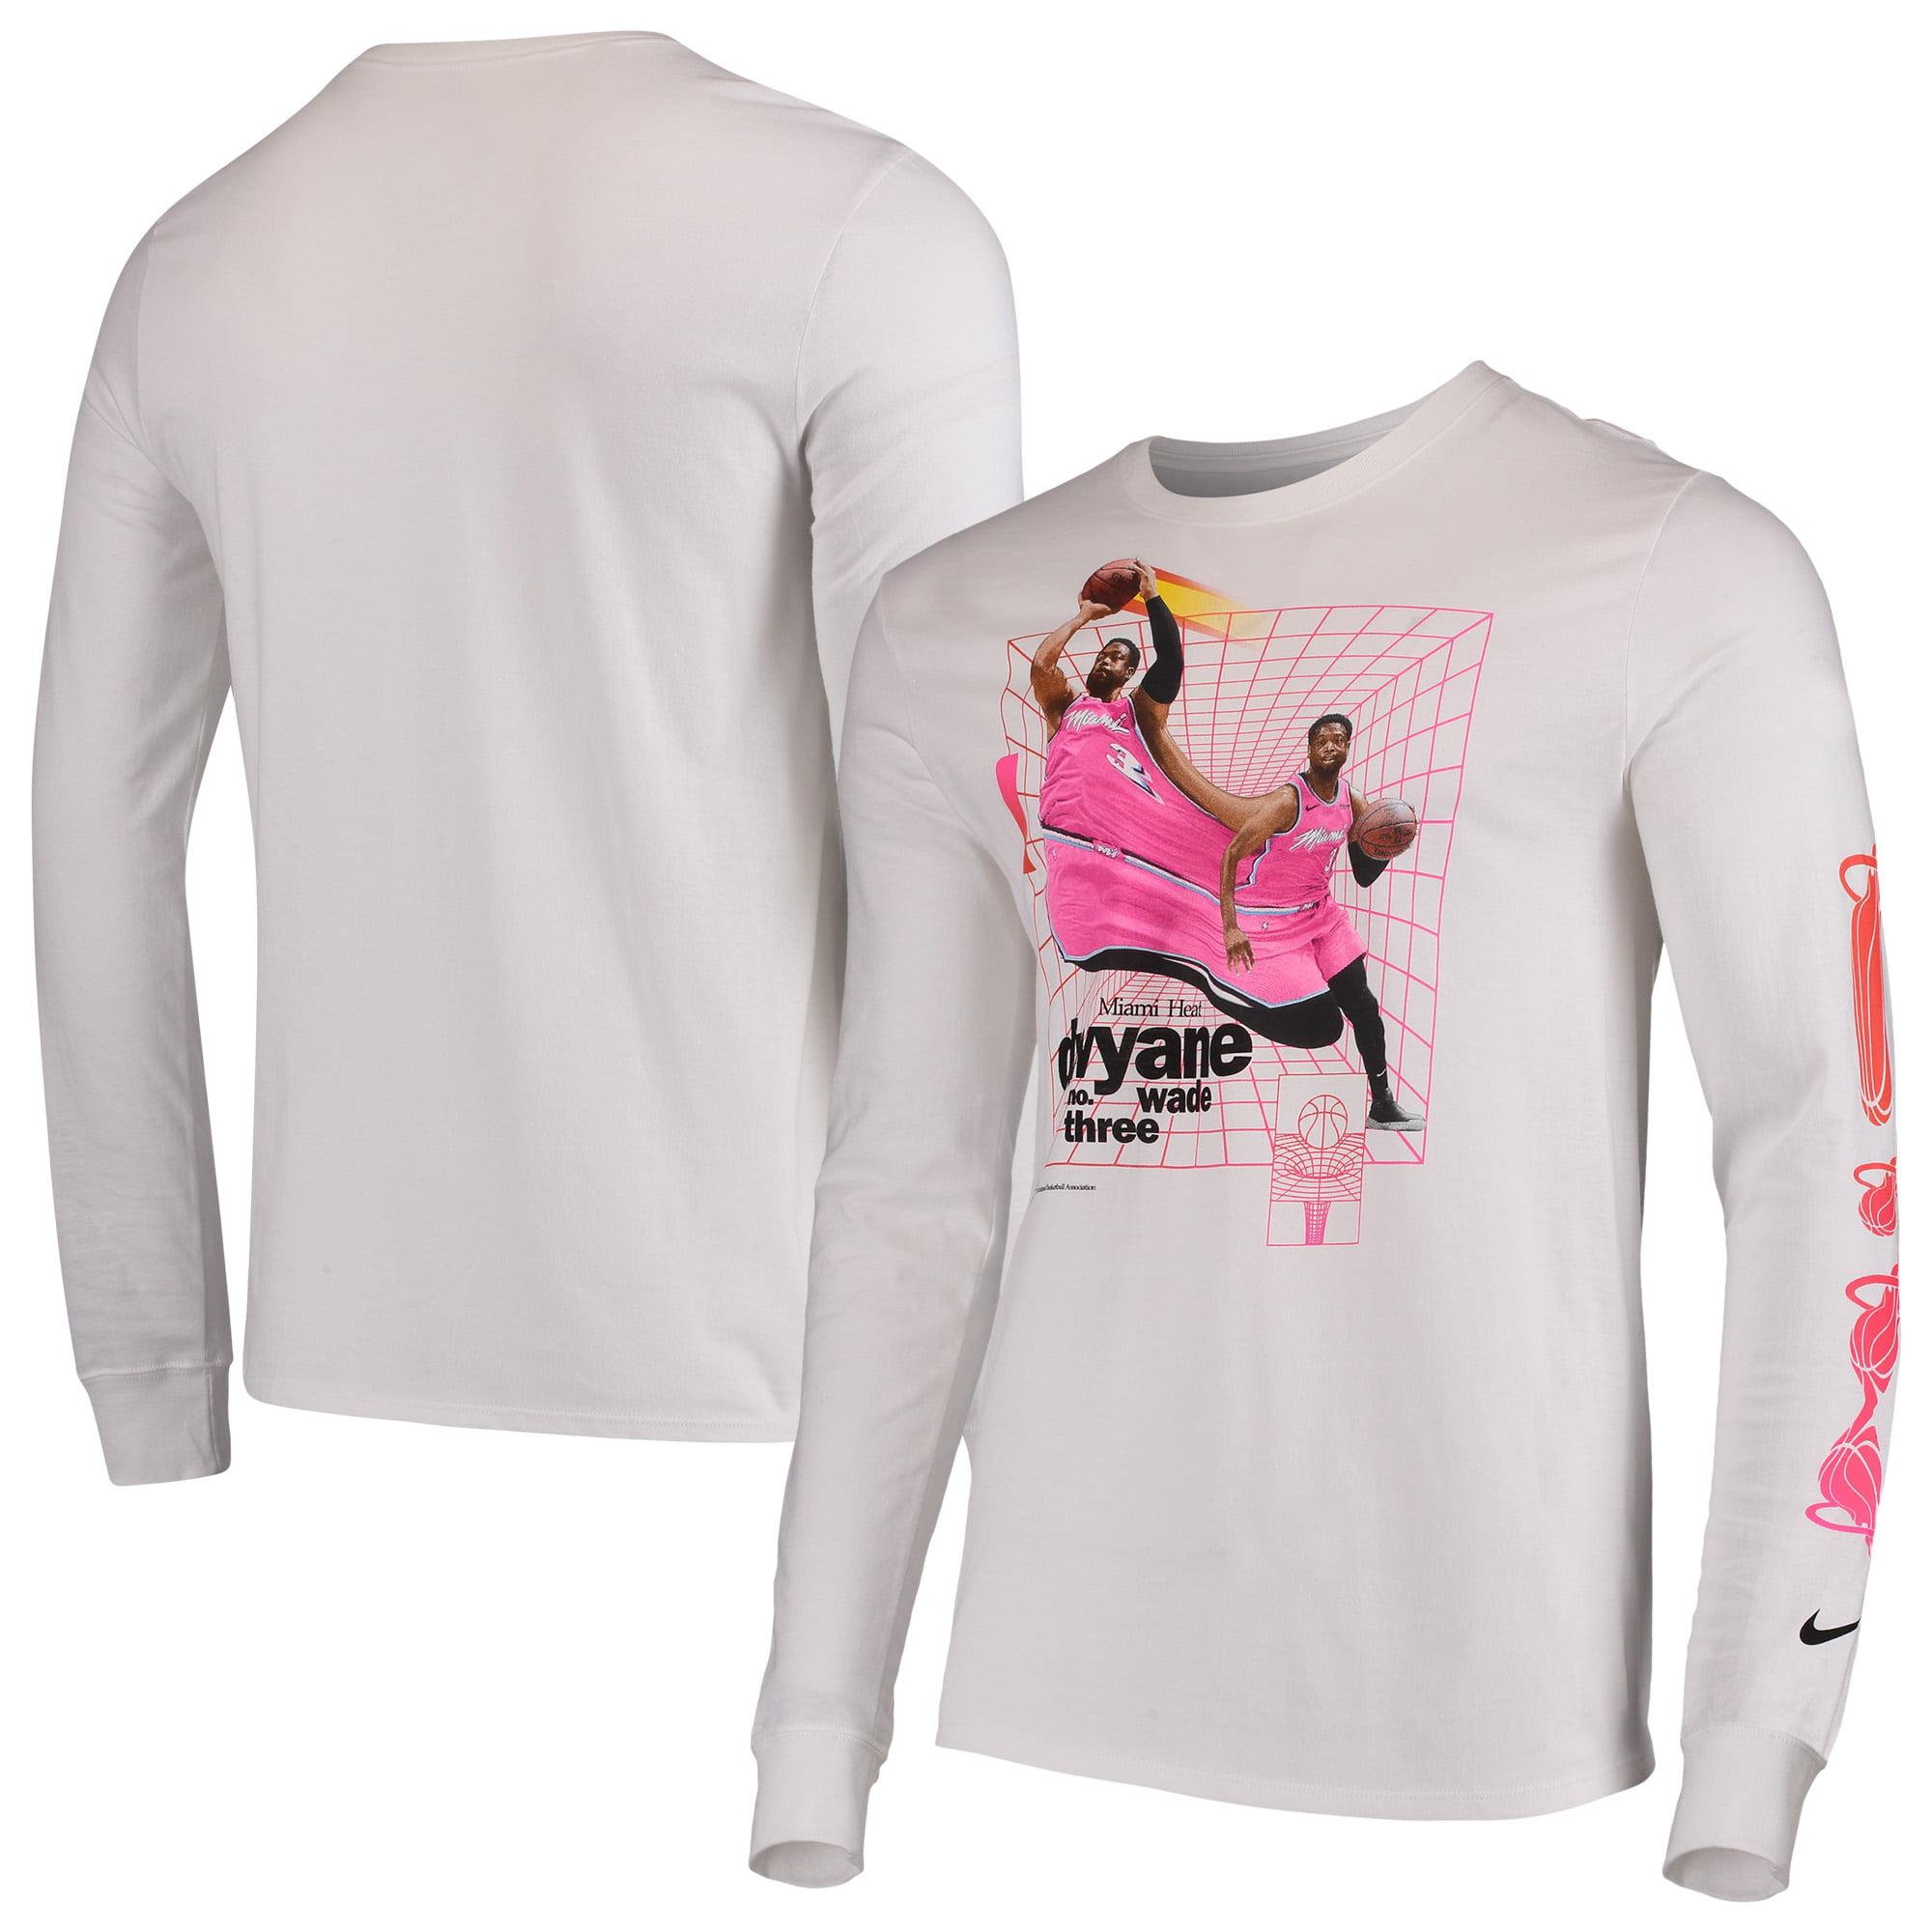 new arrival 95e8f 171f8 Dwyane Wade Miami Heat Nike Time Warp Long Sleeve T-Shirt - White